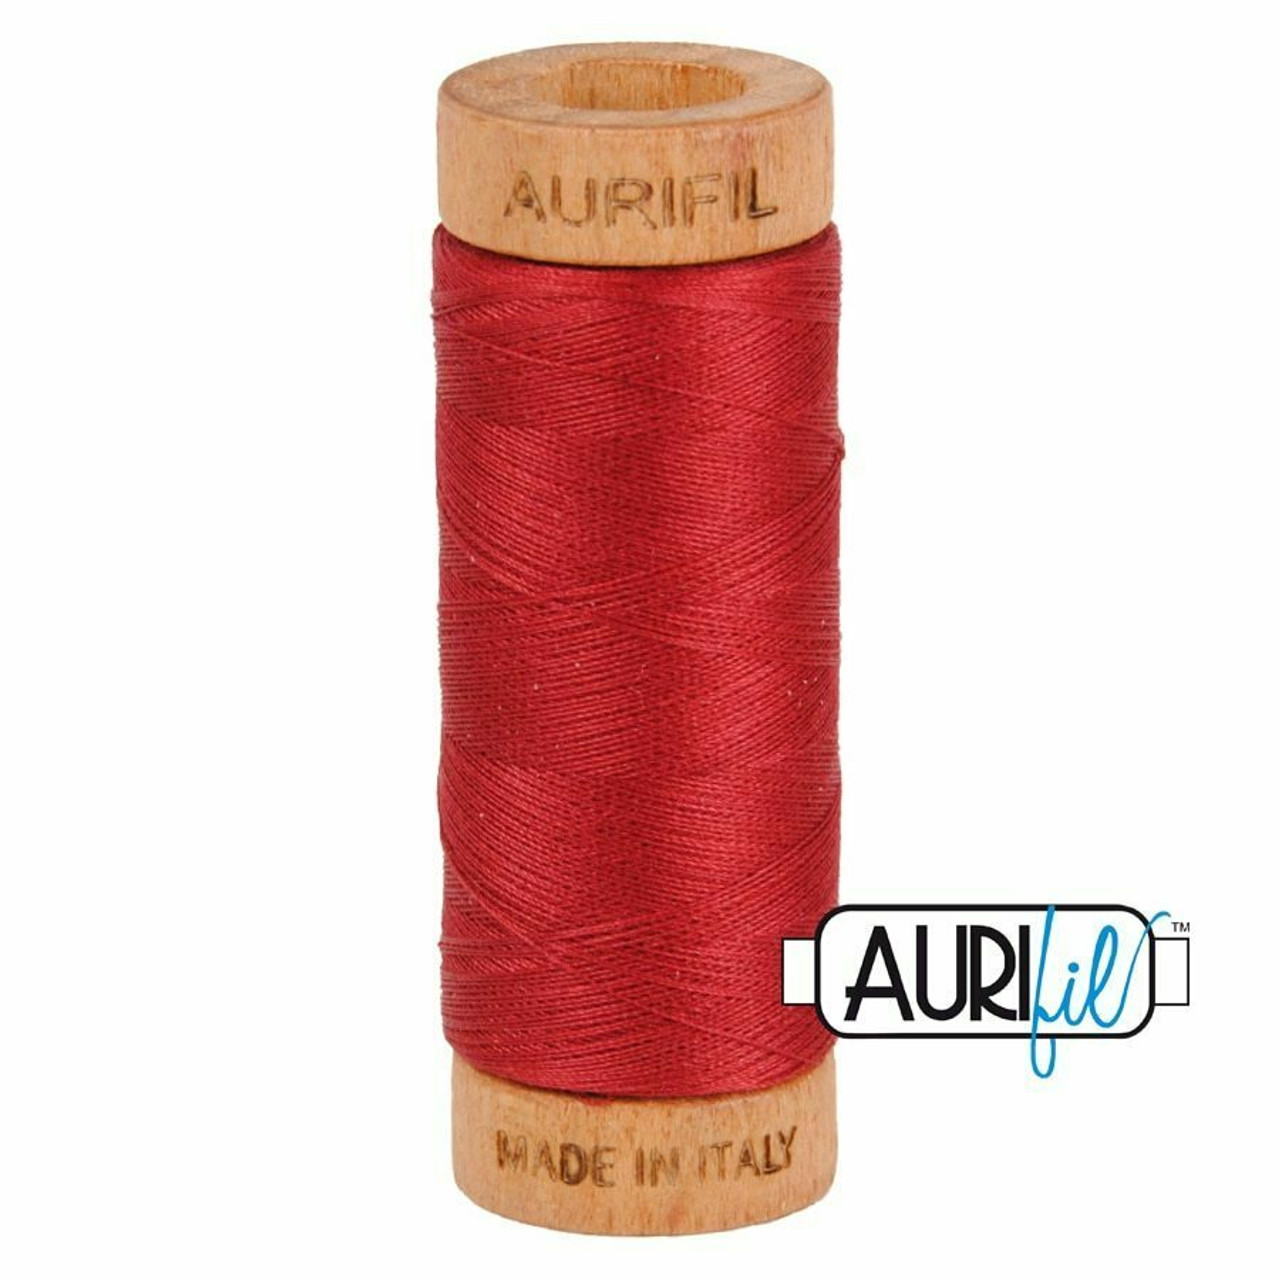 Aurifil 80wt Burgundy (1103) thread